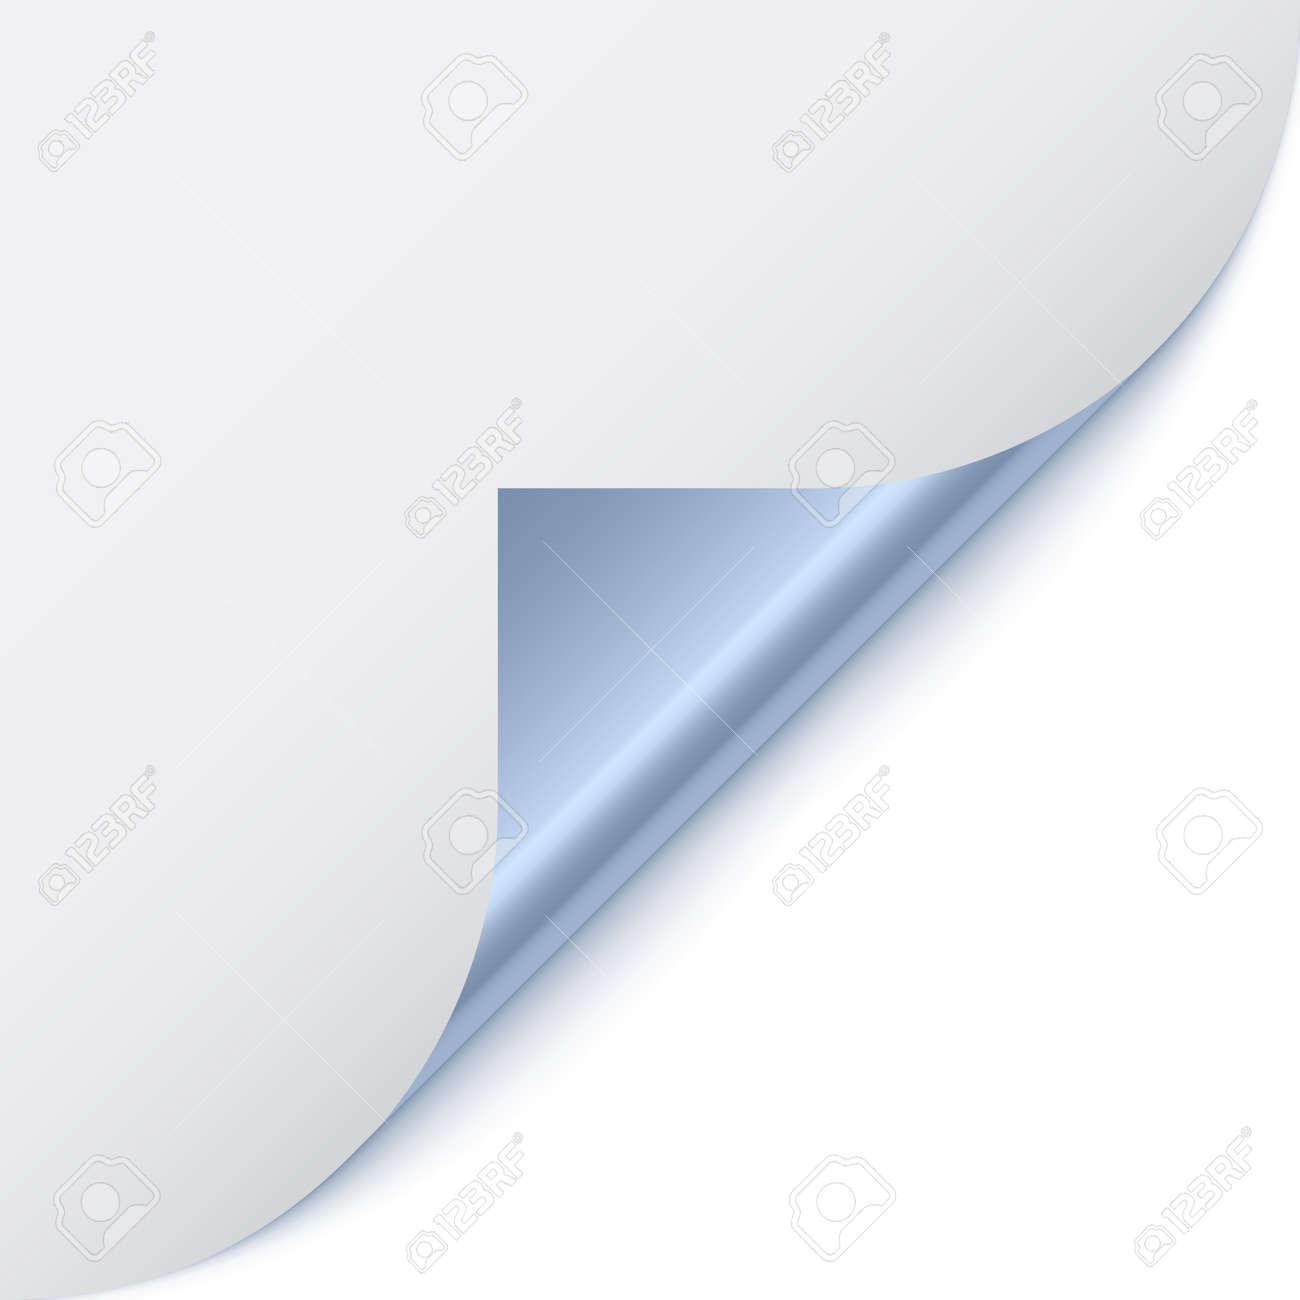 vector page corner with metallic backs Stock Vector - 11486898